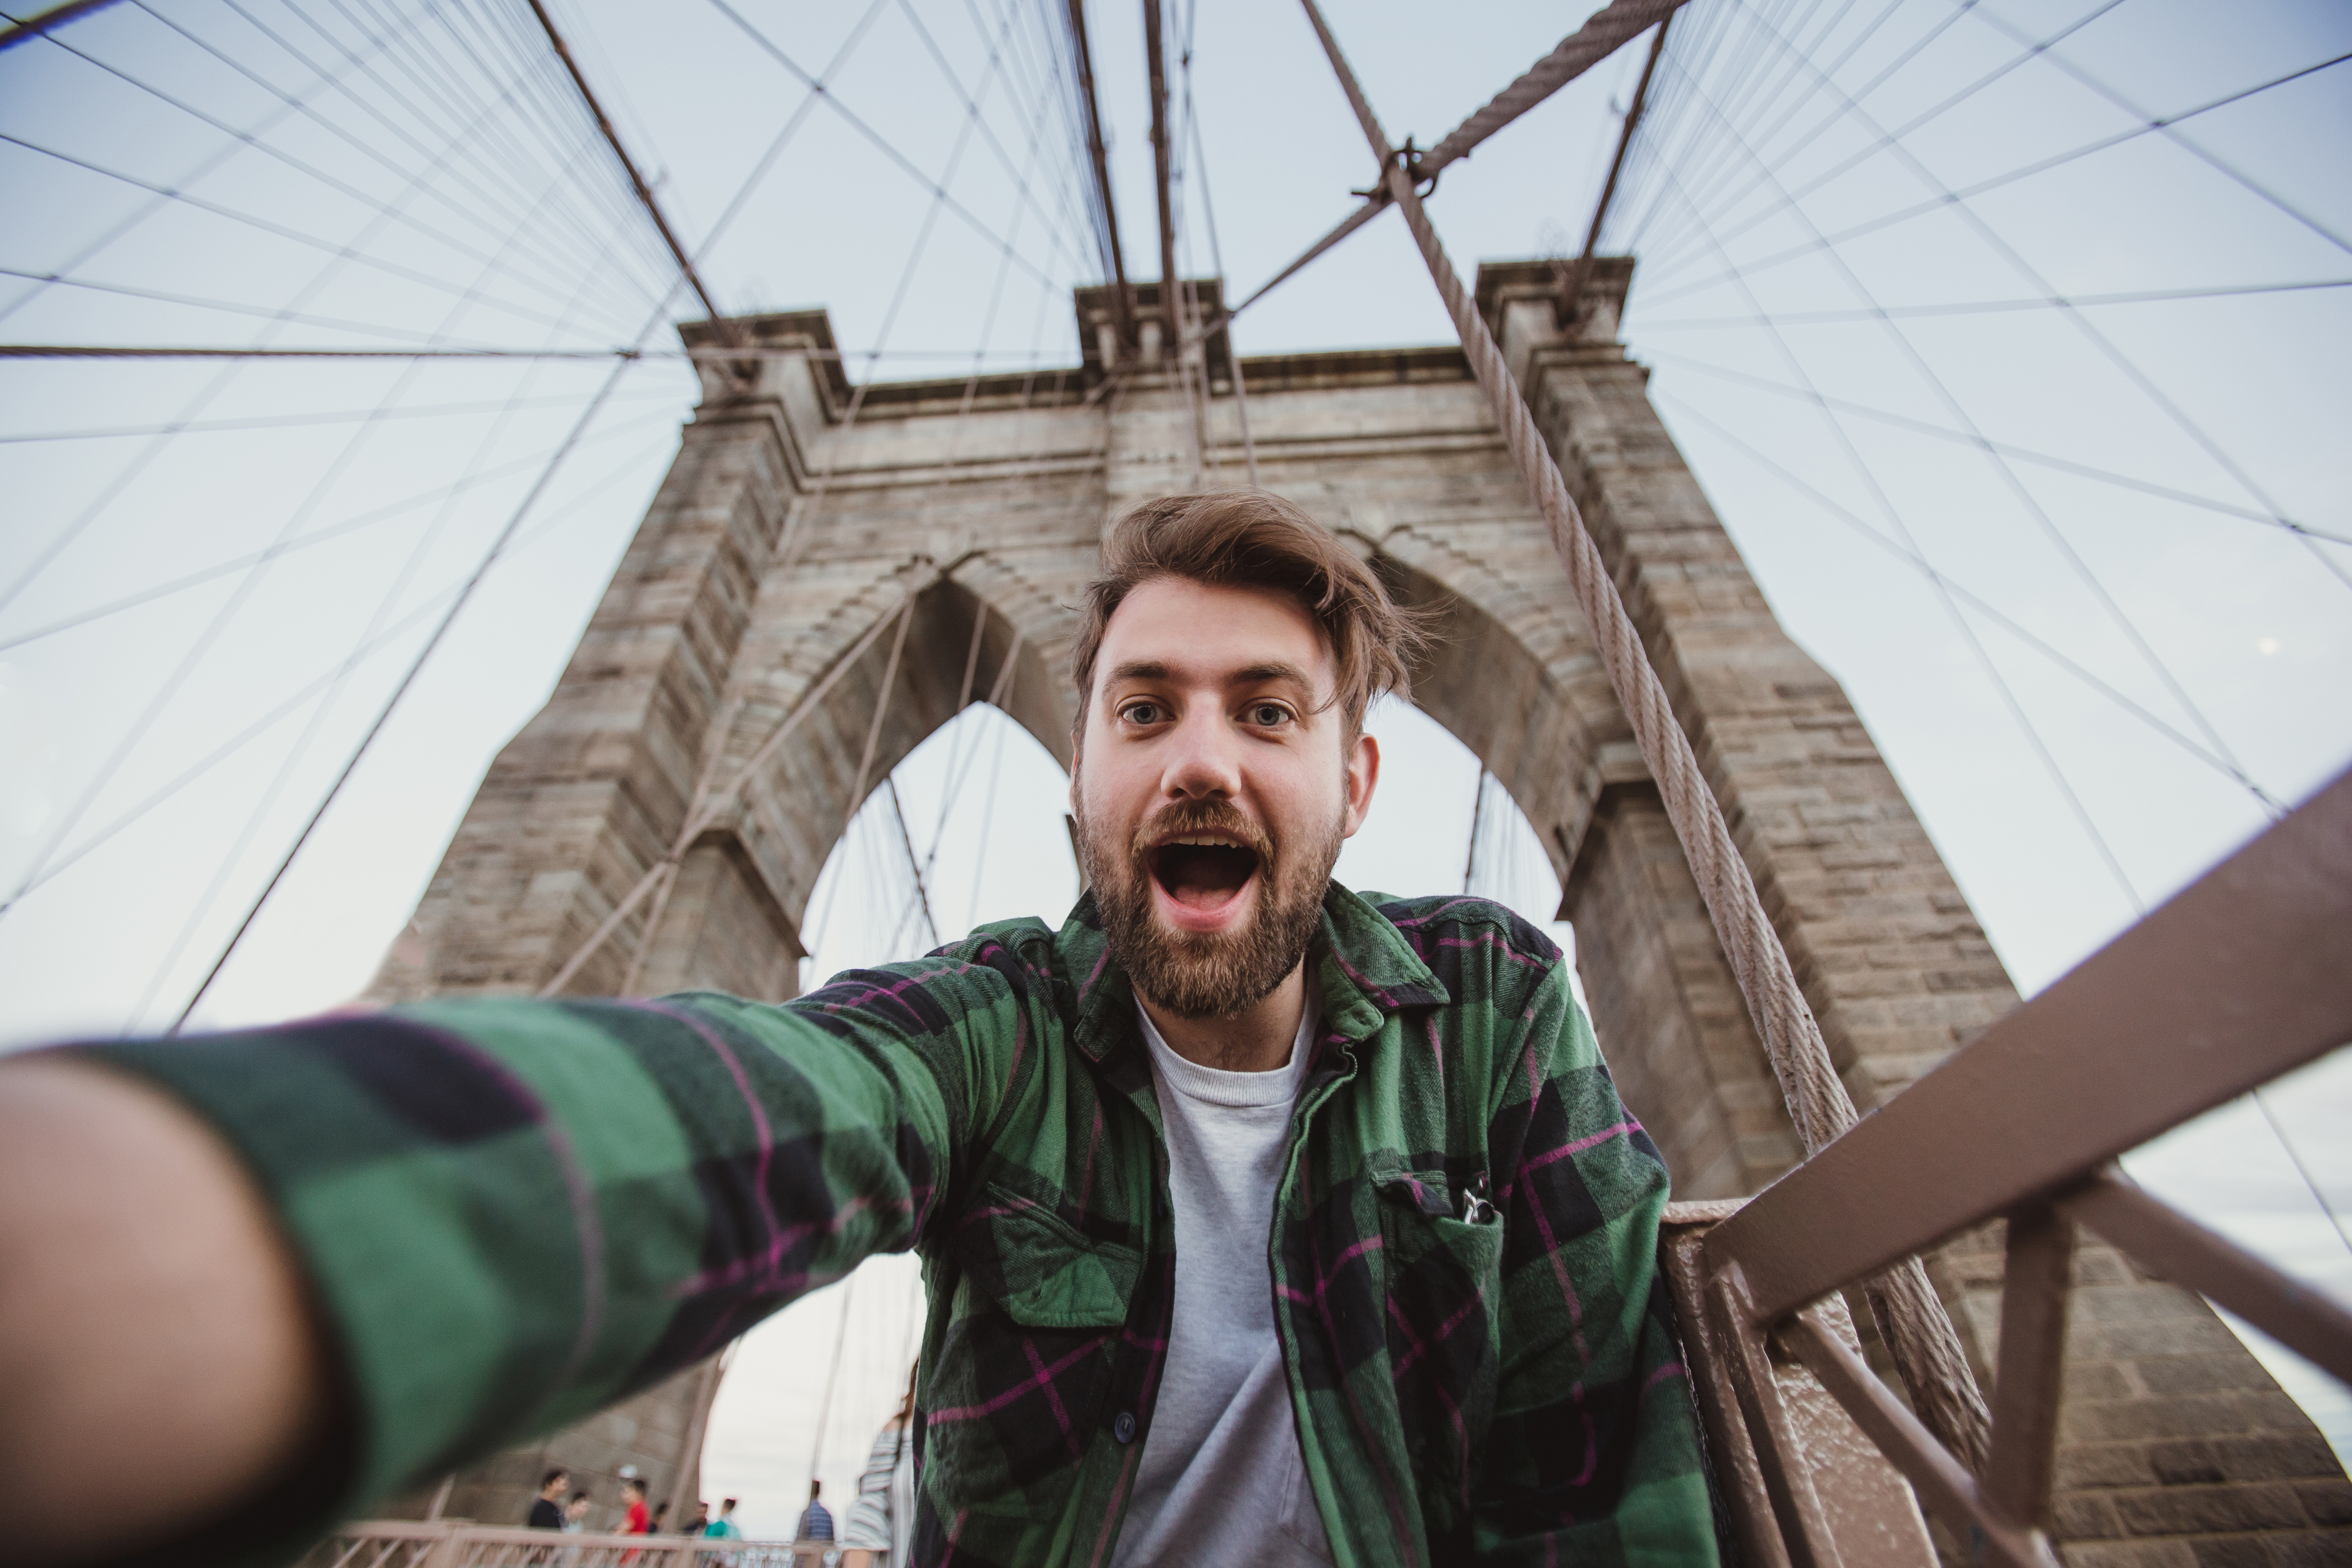 Handsome hipster guy taking selfie self-portrait on Brooklyn Bridge, New York.jpg Cute bearded stude